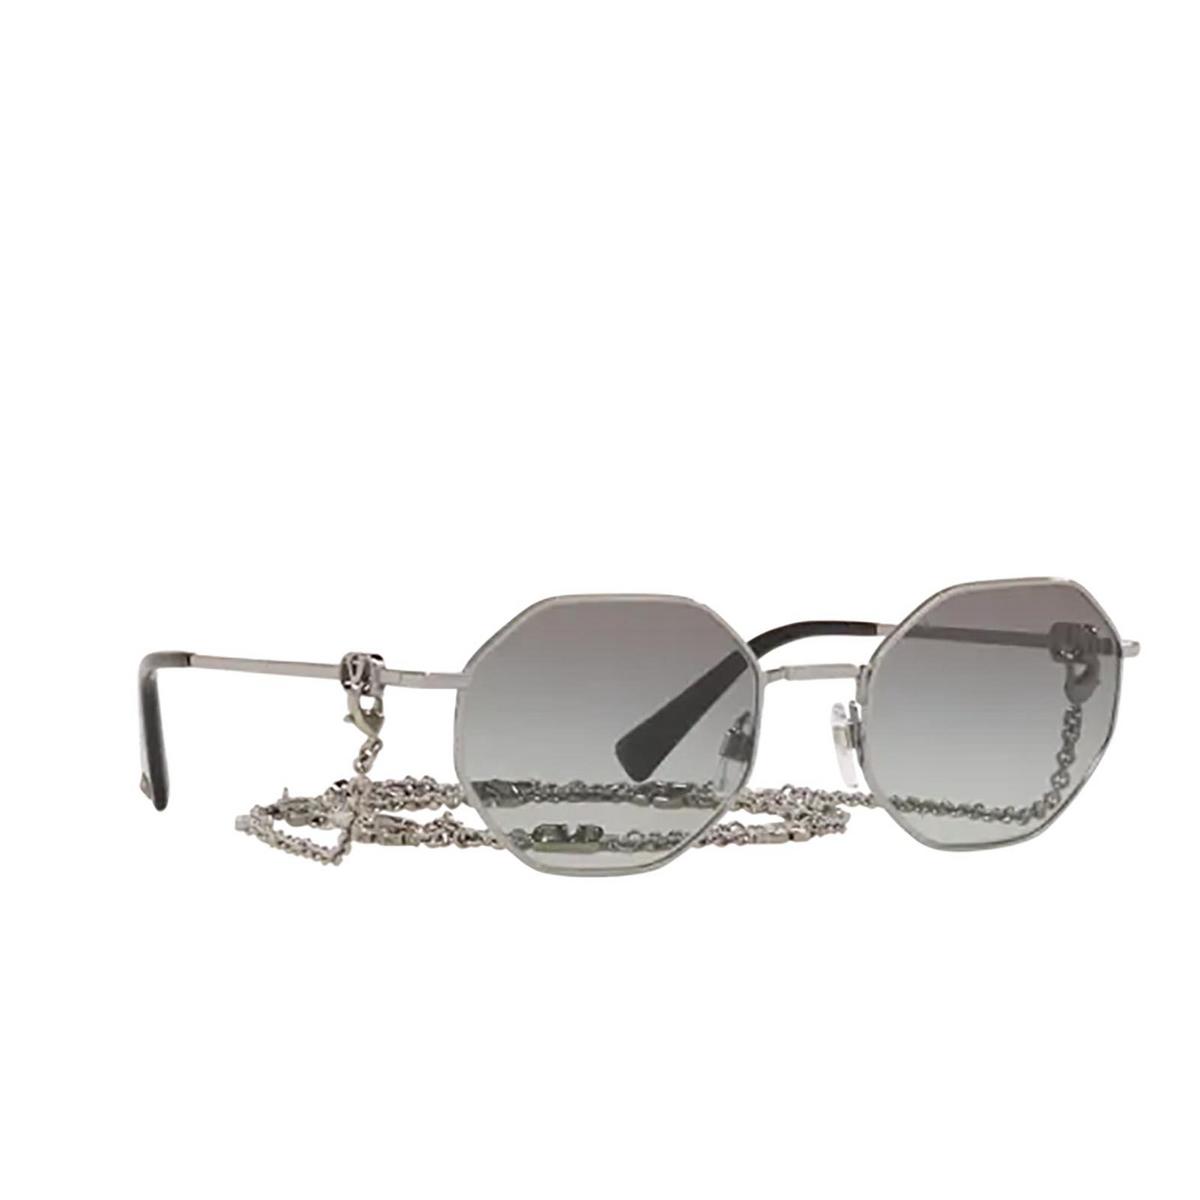 Valentino® Irregular Sunglasses: VA2040 color Gunmetal 300511 - three-quarters view.